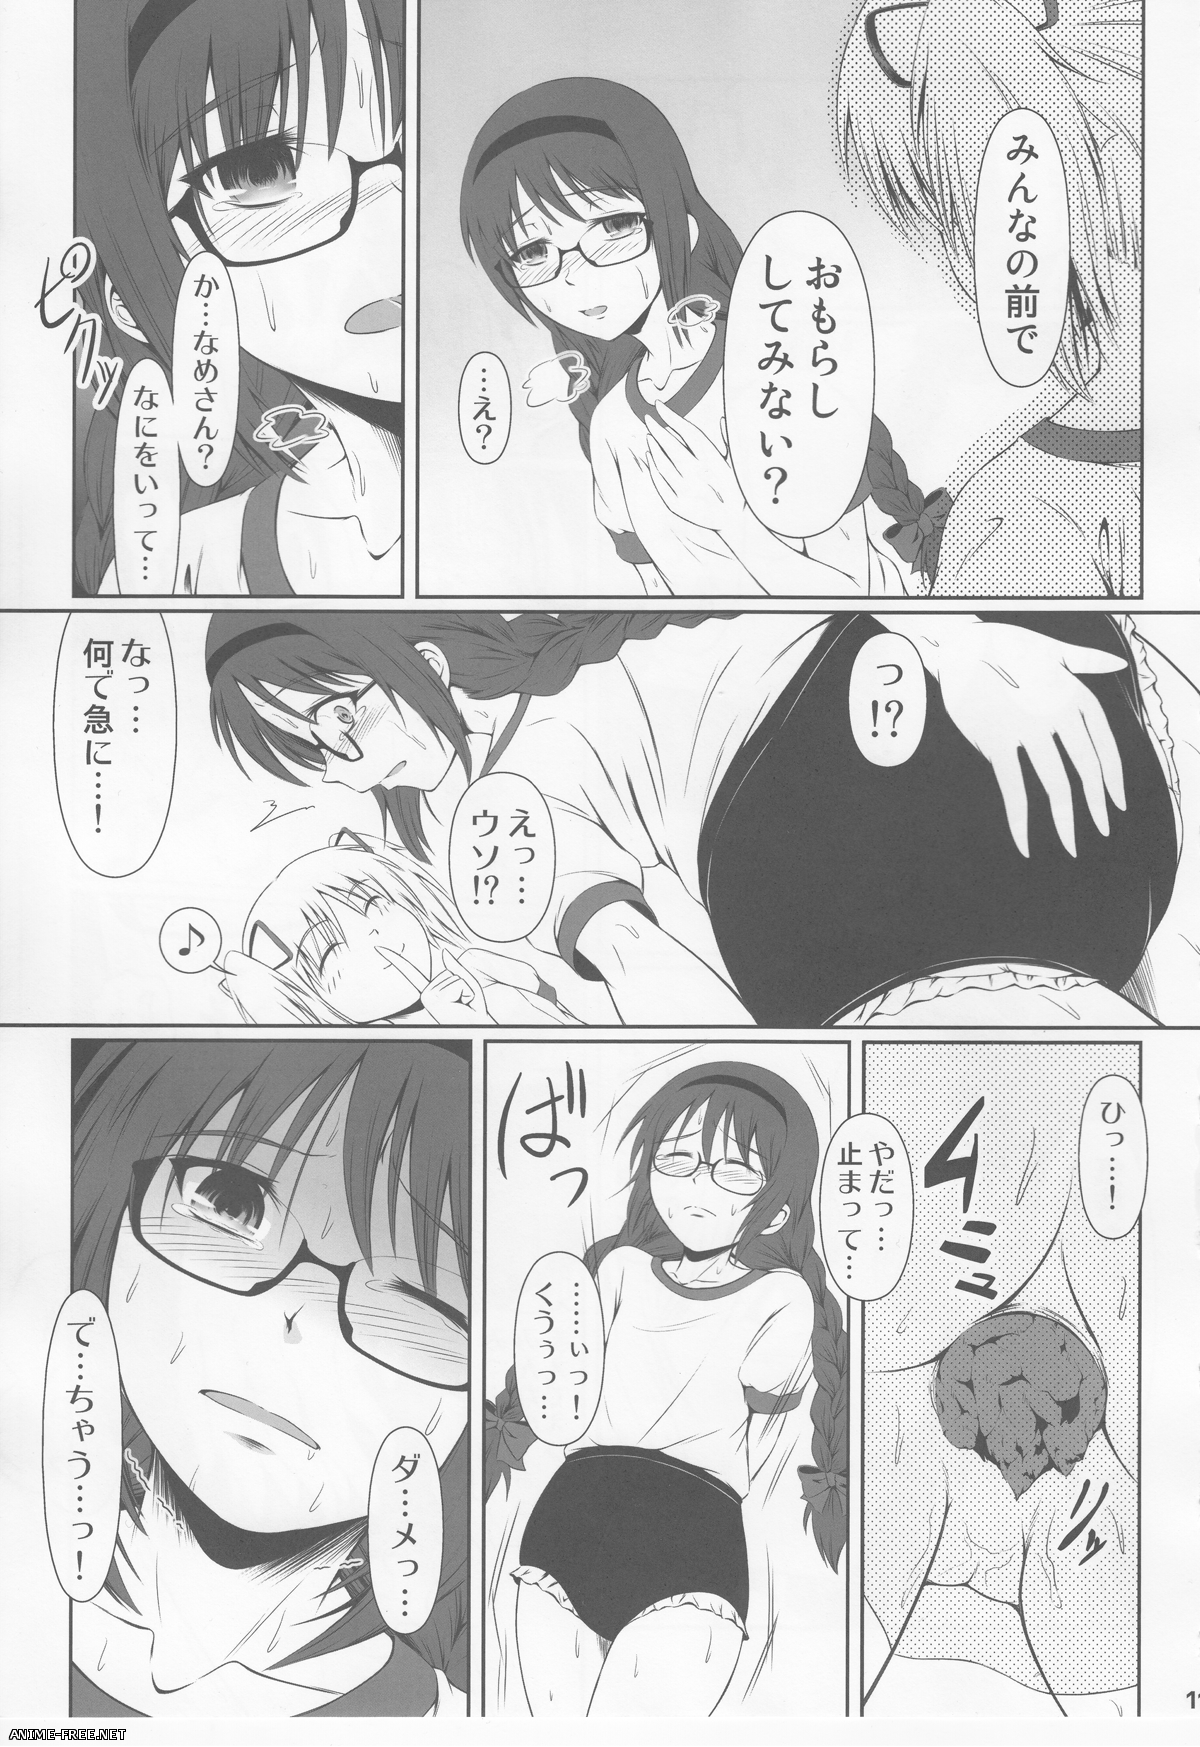 Mikuni Atsuko / Atelier Lunette — Сборник хентай манги [Cen] [JAP,ENG] Manga Hentai